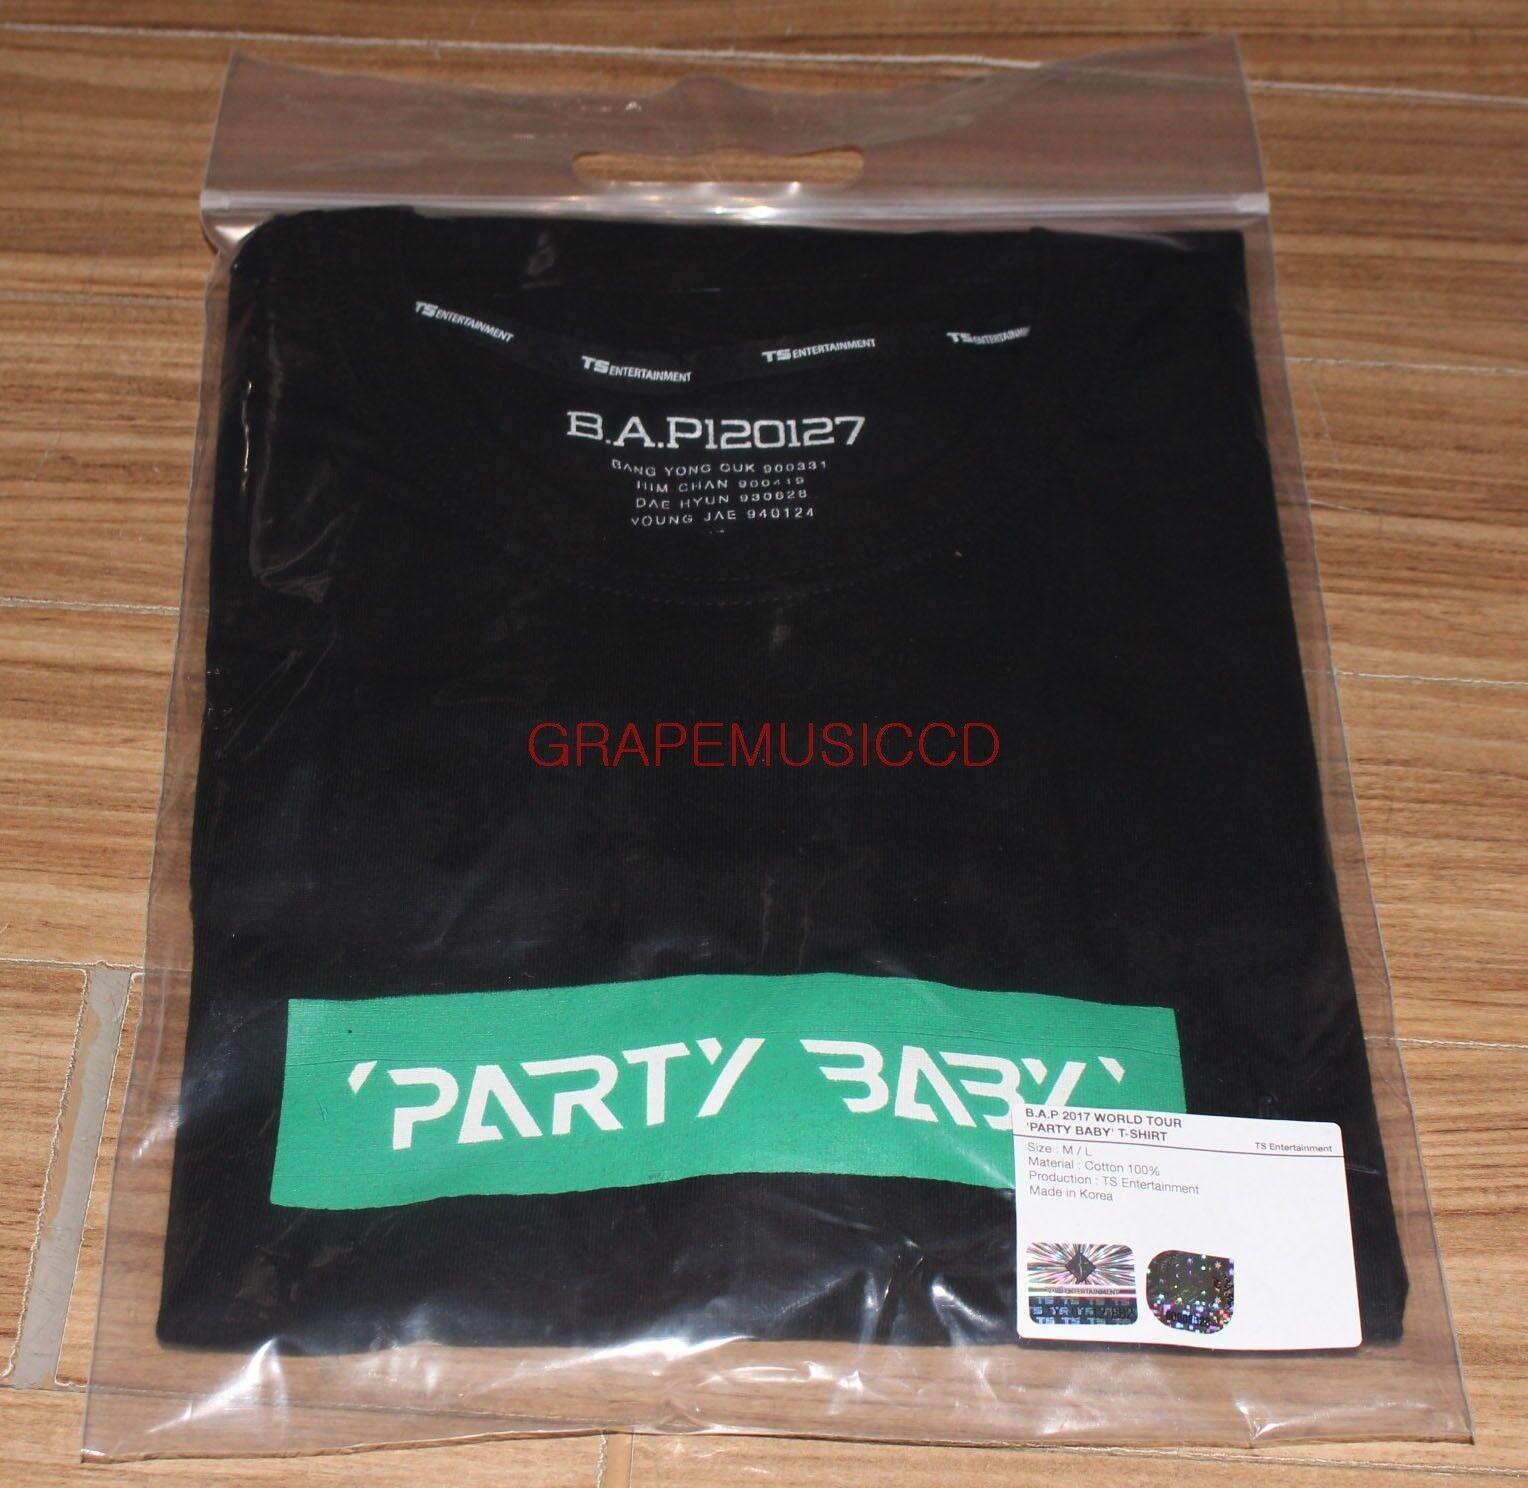 B.a.p bap 2017 world tour party baby! official goods t-shirt t-shirts l size new